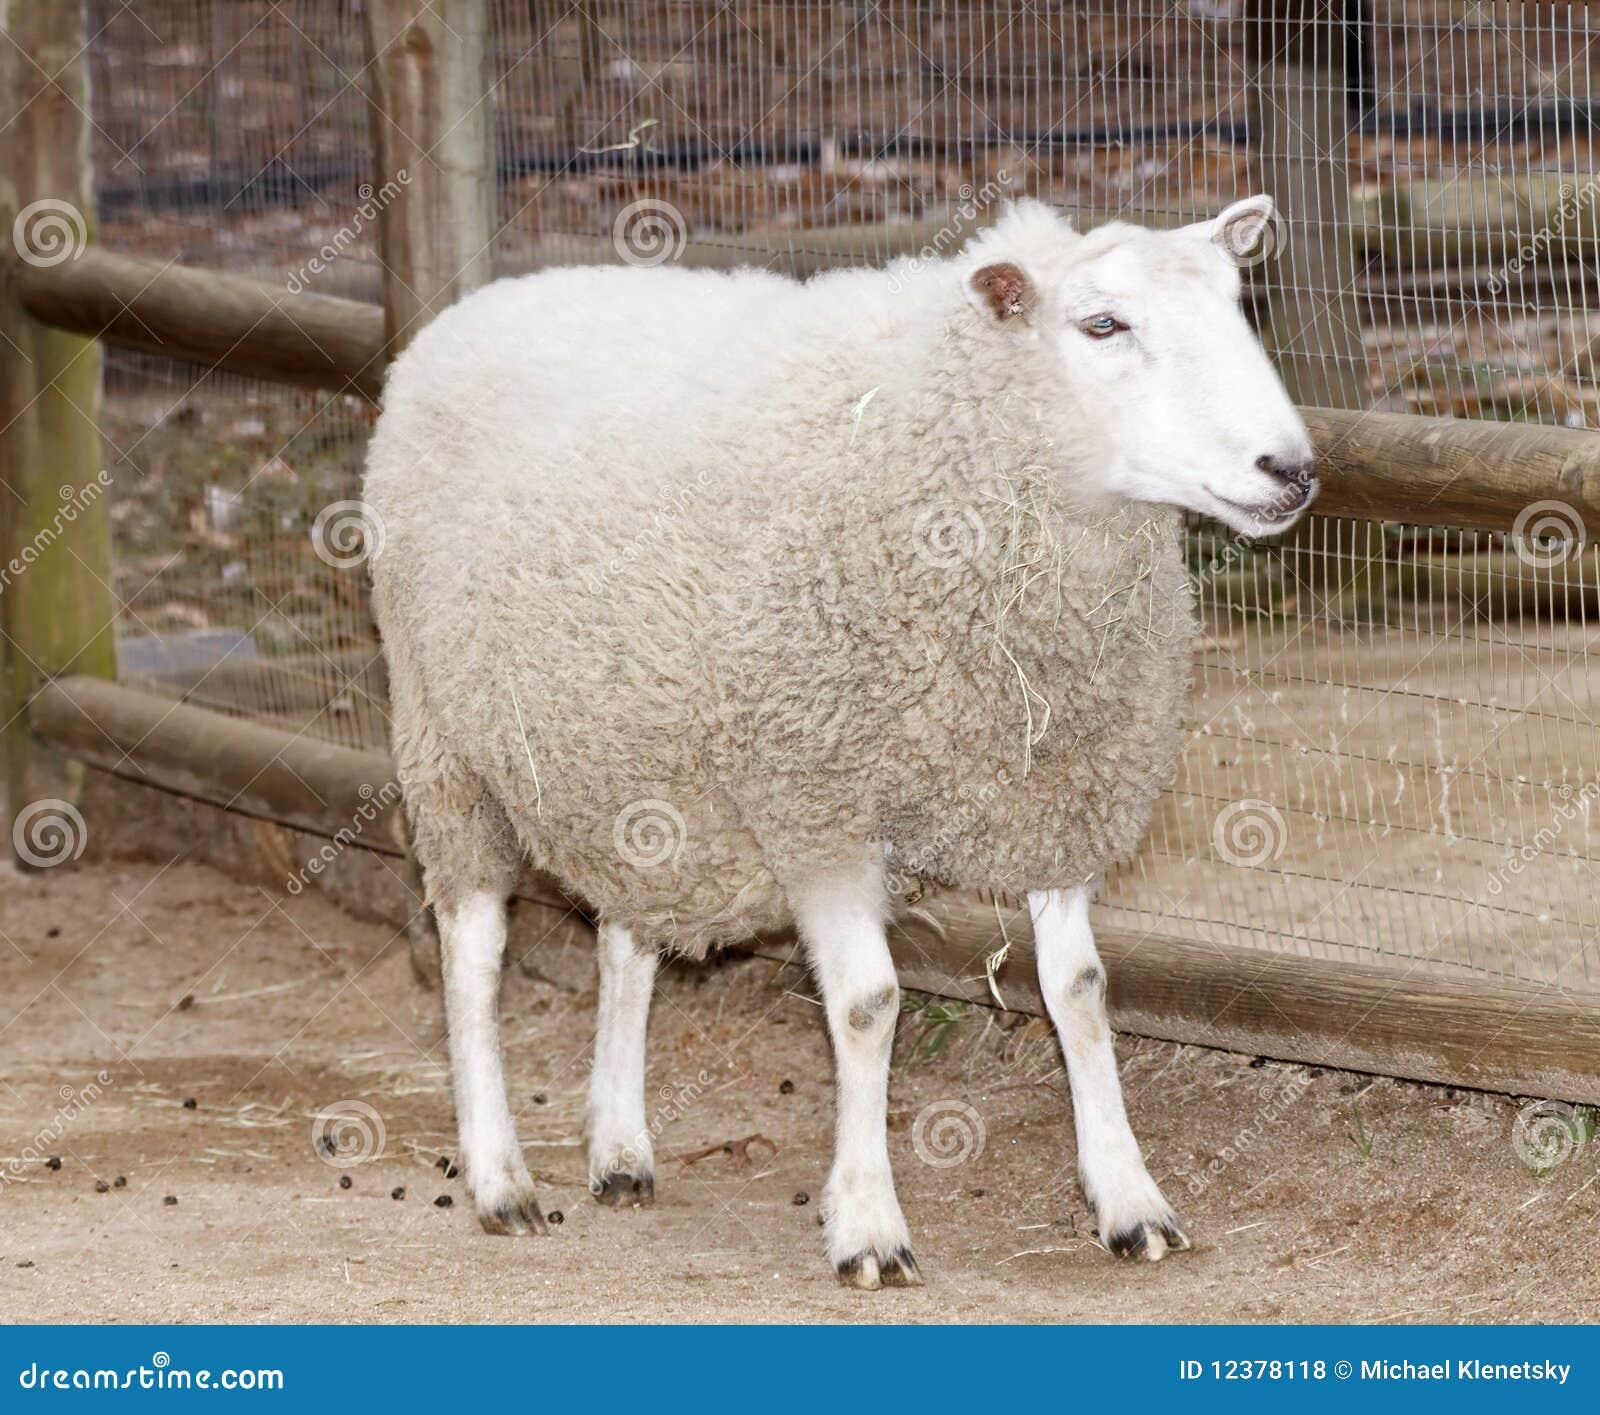 White sheep - photo#7